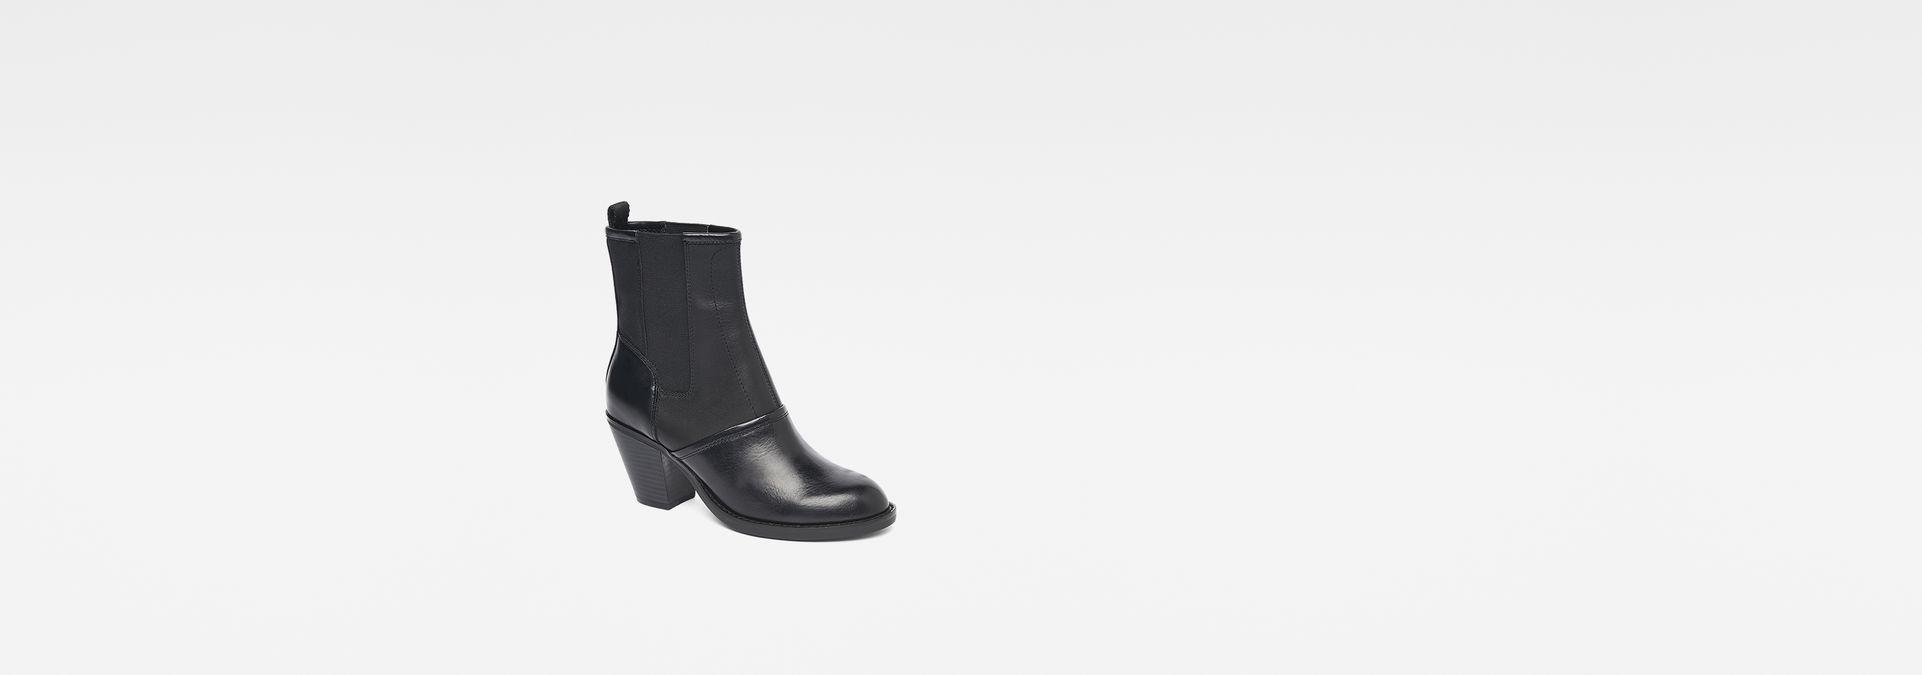 G-star Lynn Chelsea Botte Chaussures Noir zOmw2